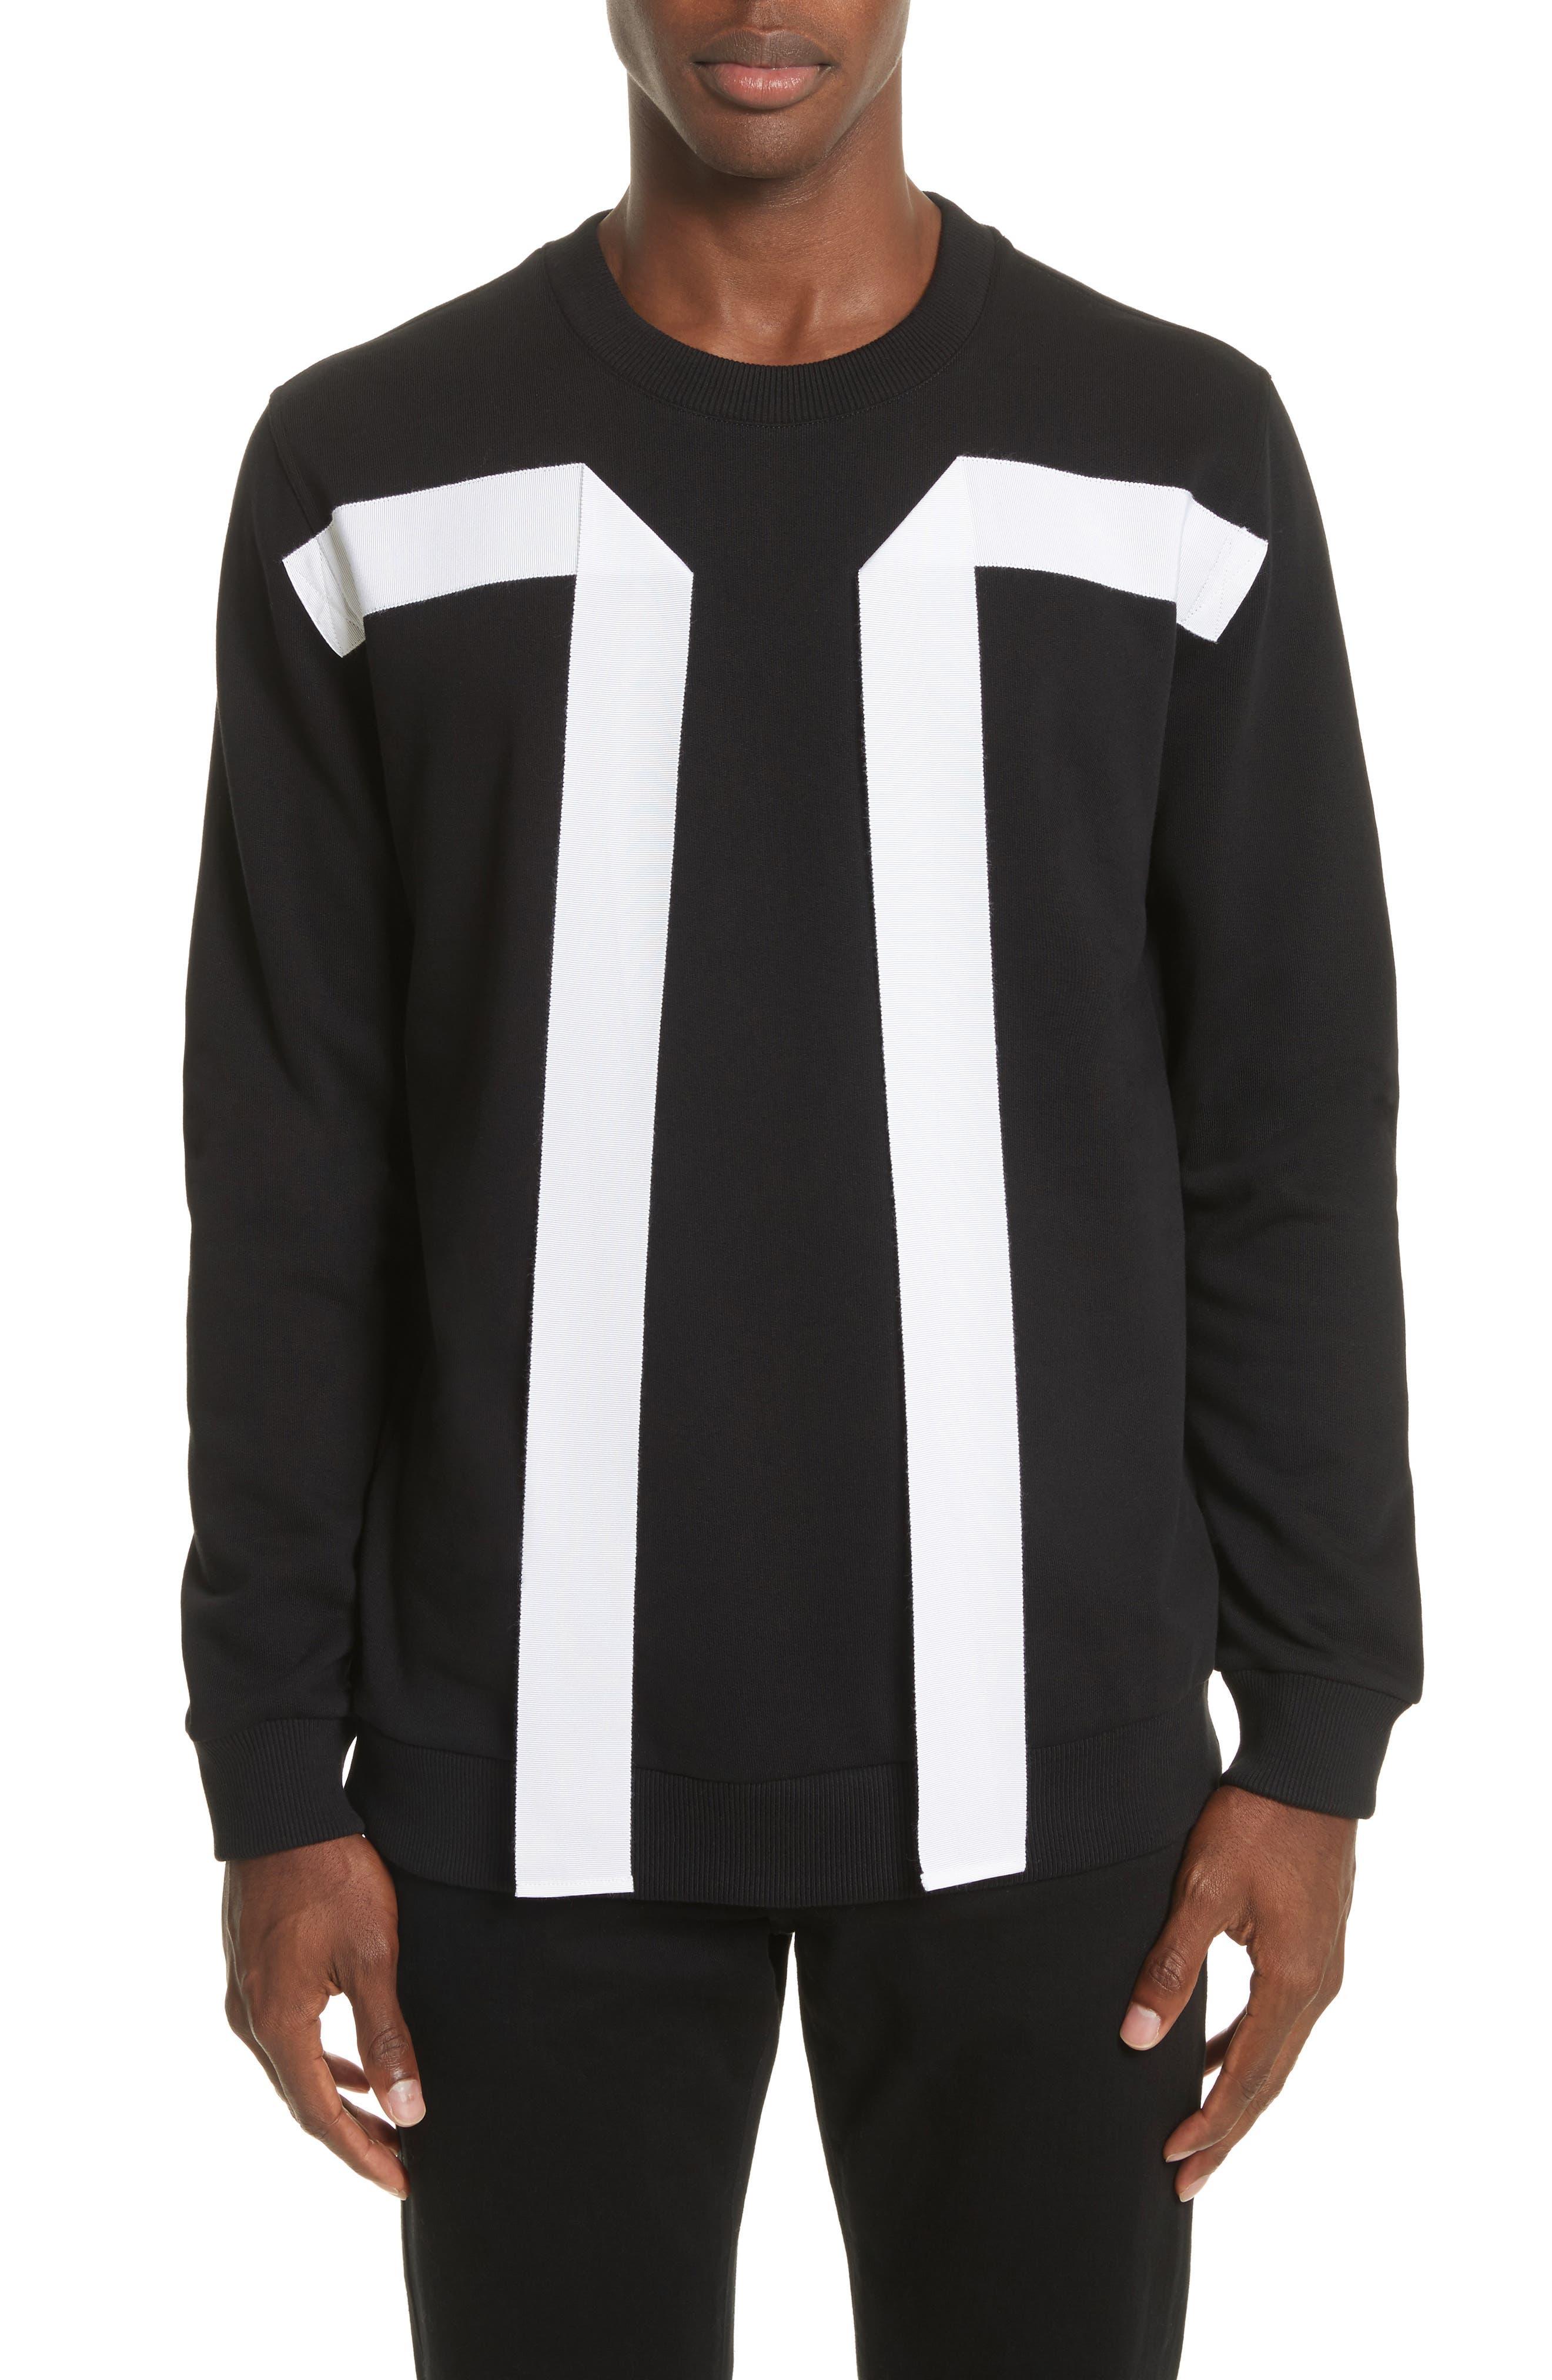 Flying Bands Crewneck Sweatshirt,                         Main,                         color, 001